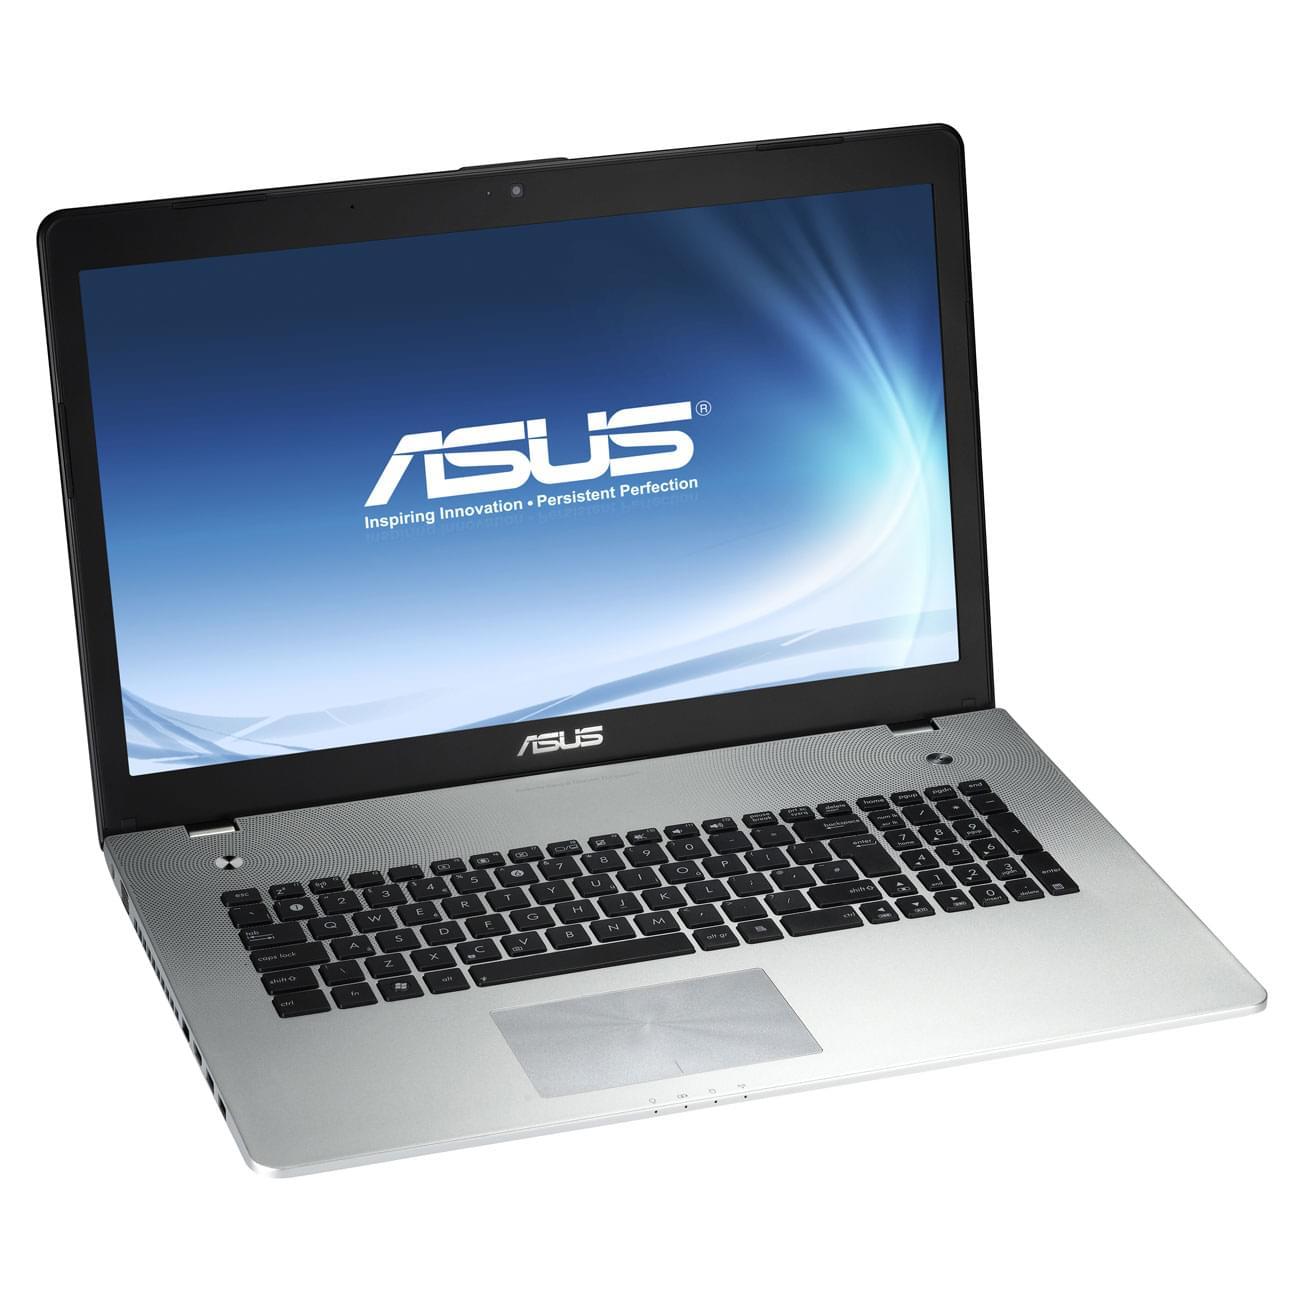 Asus N76VZ-V2G-T1101V (N76VZ-V2G-T1101V) - Achat / Vente PC portable sur Cybertek.fr - 0